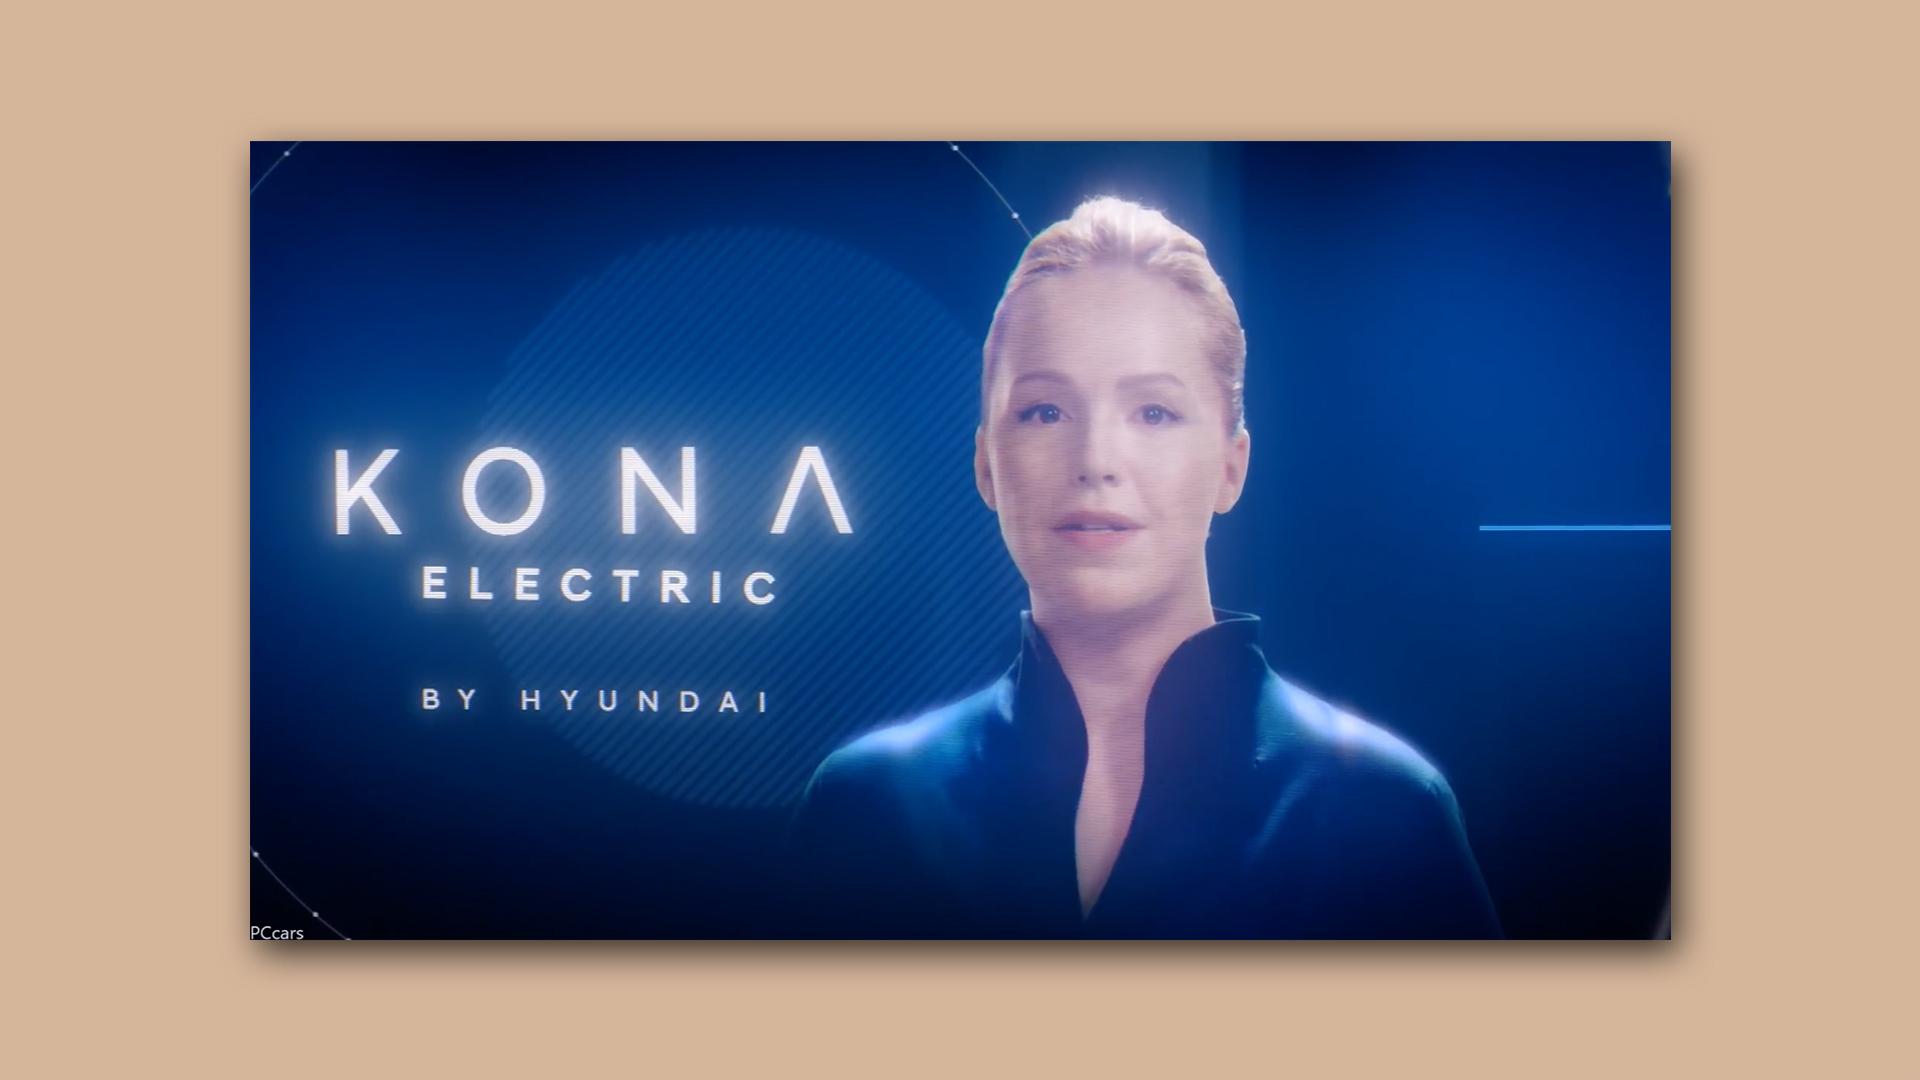 Hyundai – Kona Electric